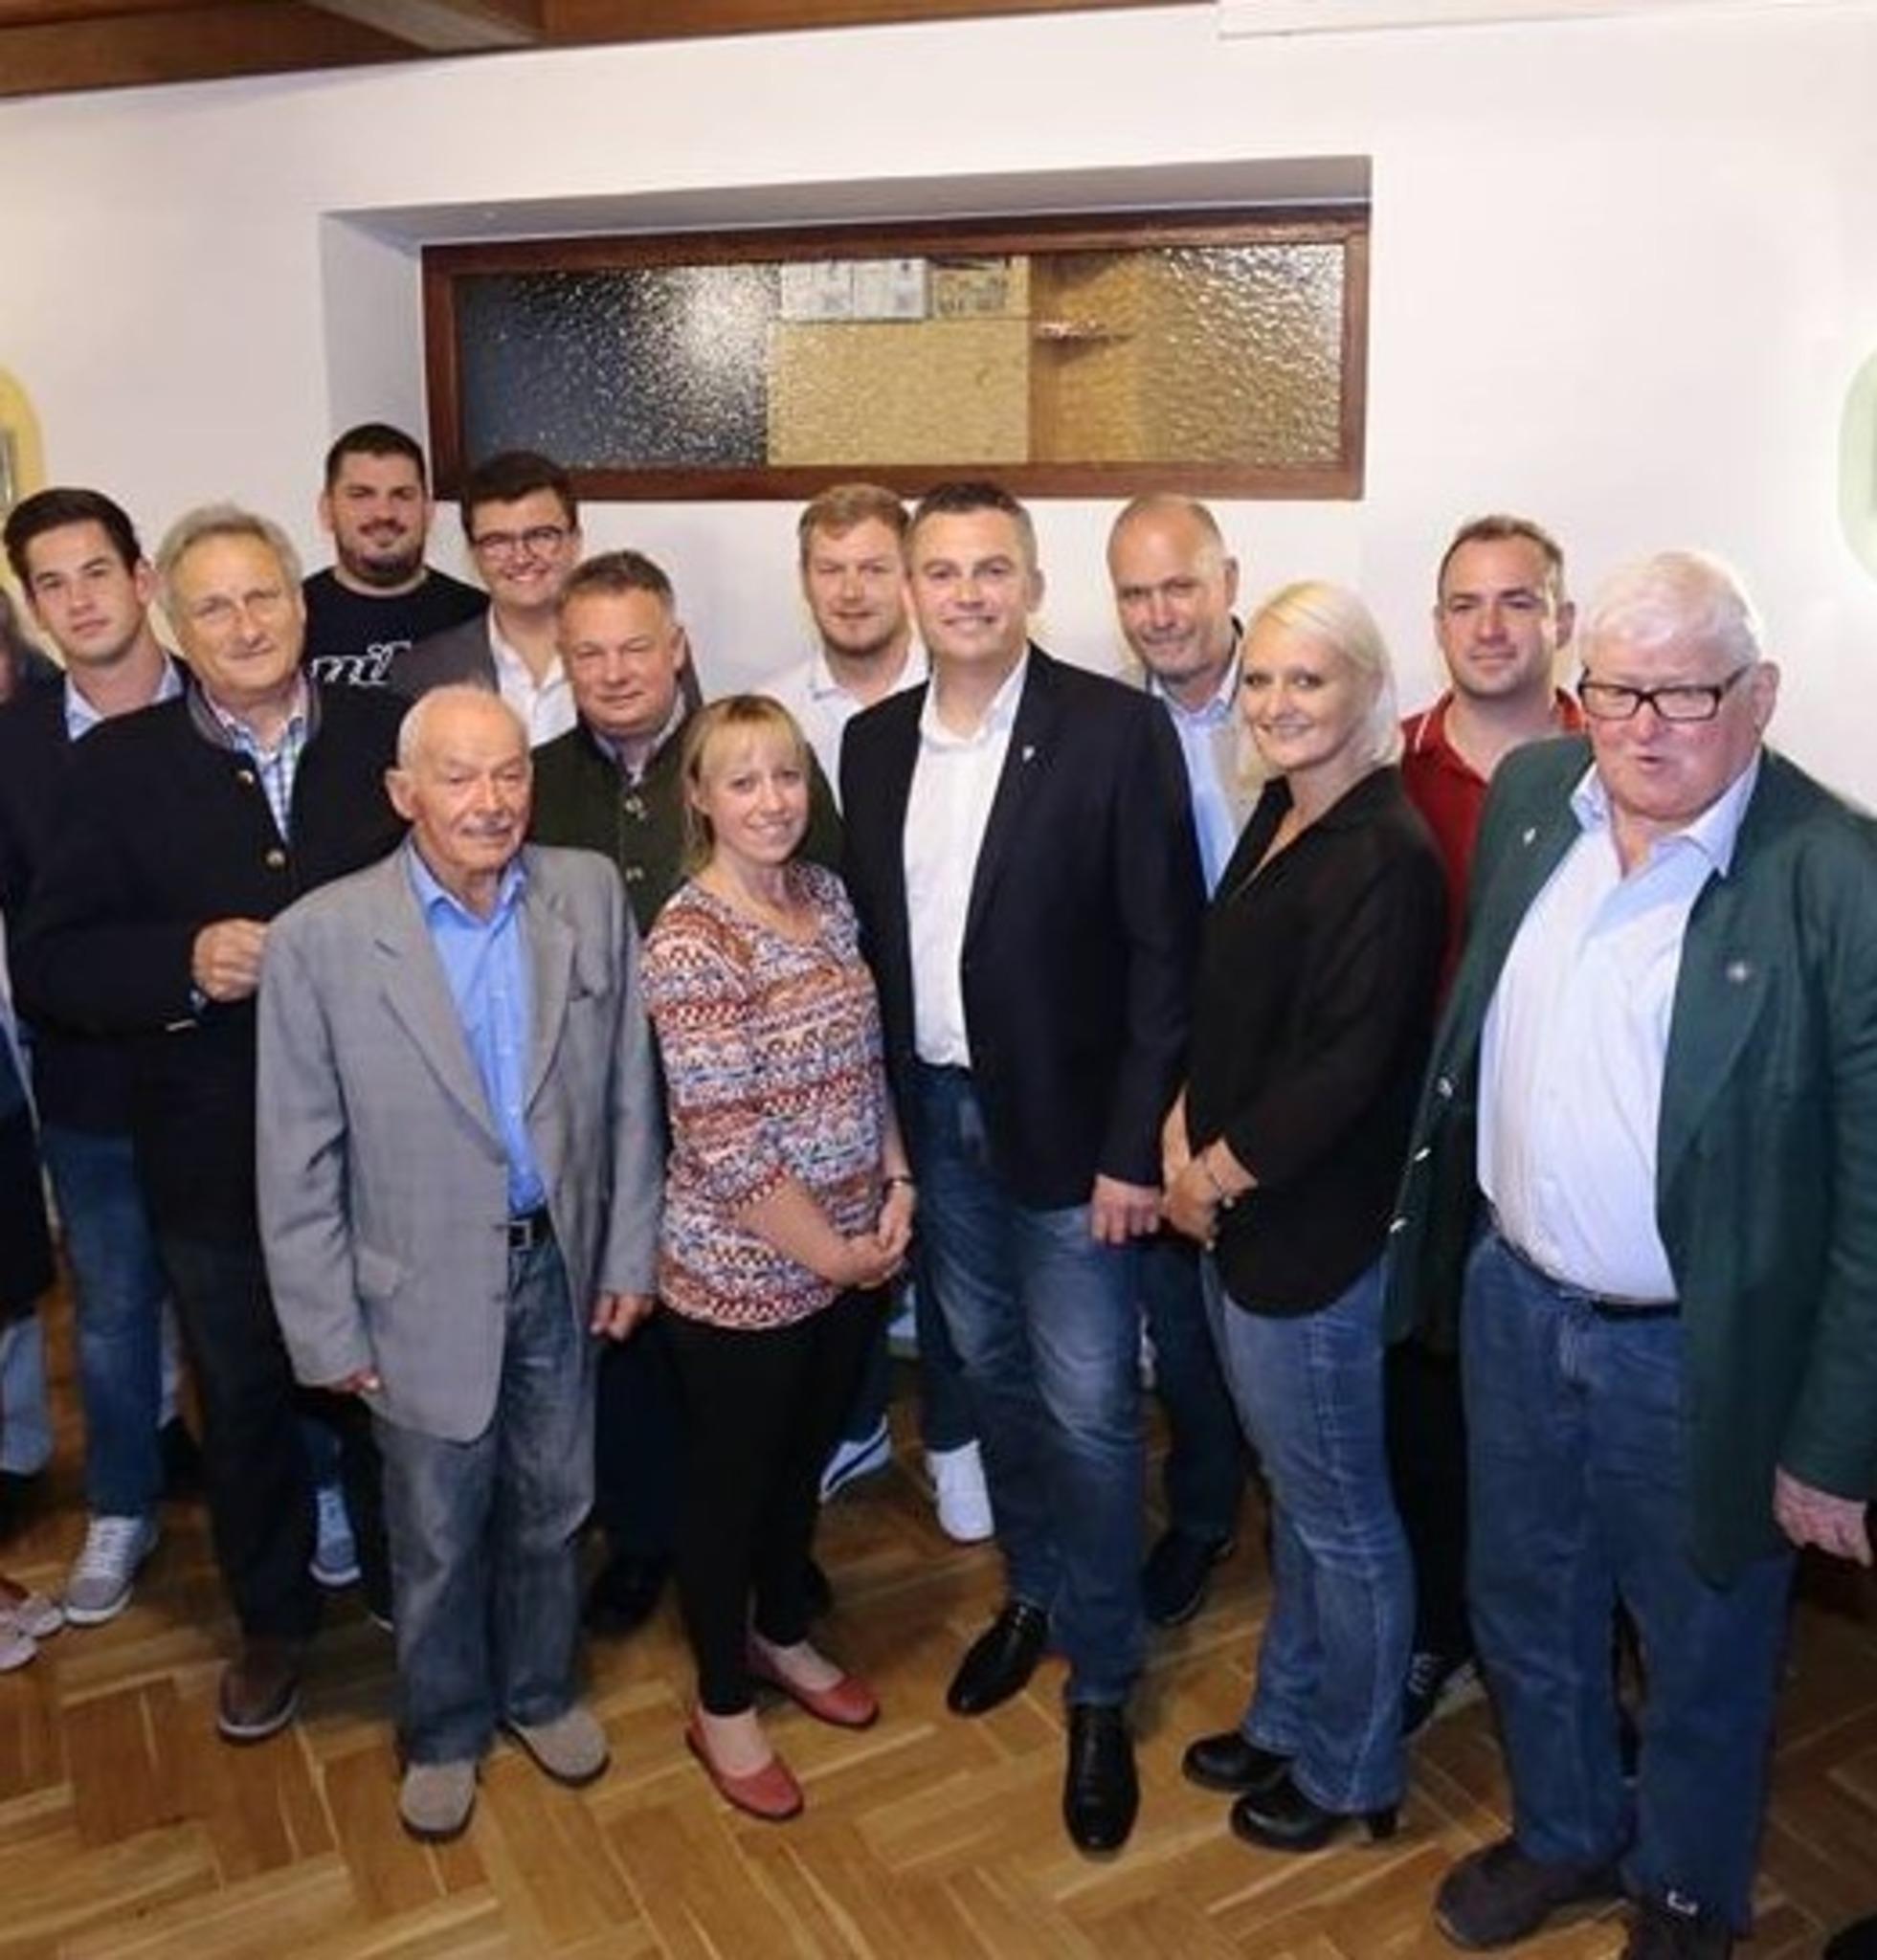 Single event scheifling: Blind dating in stegersbach